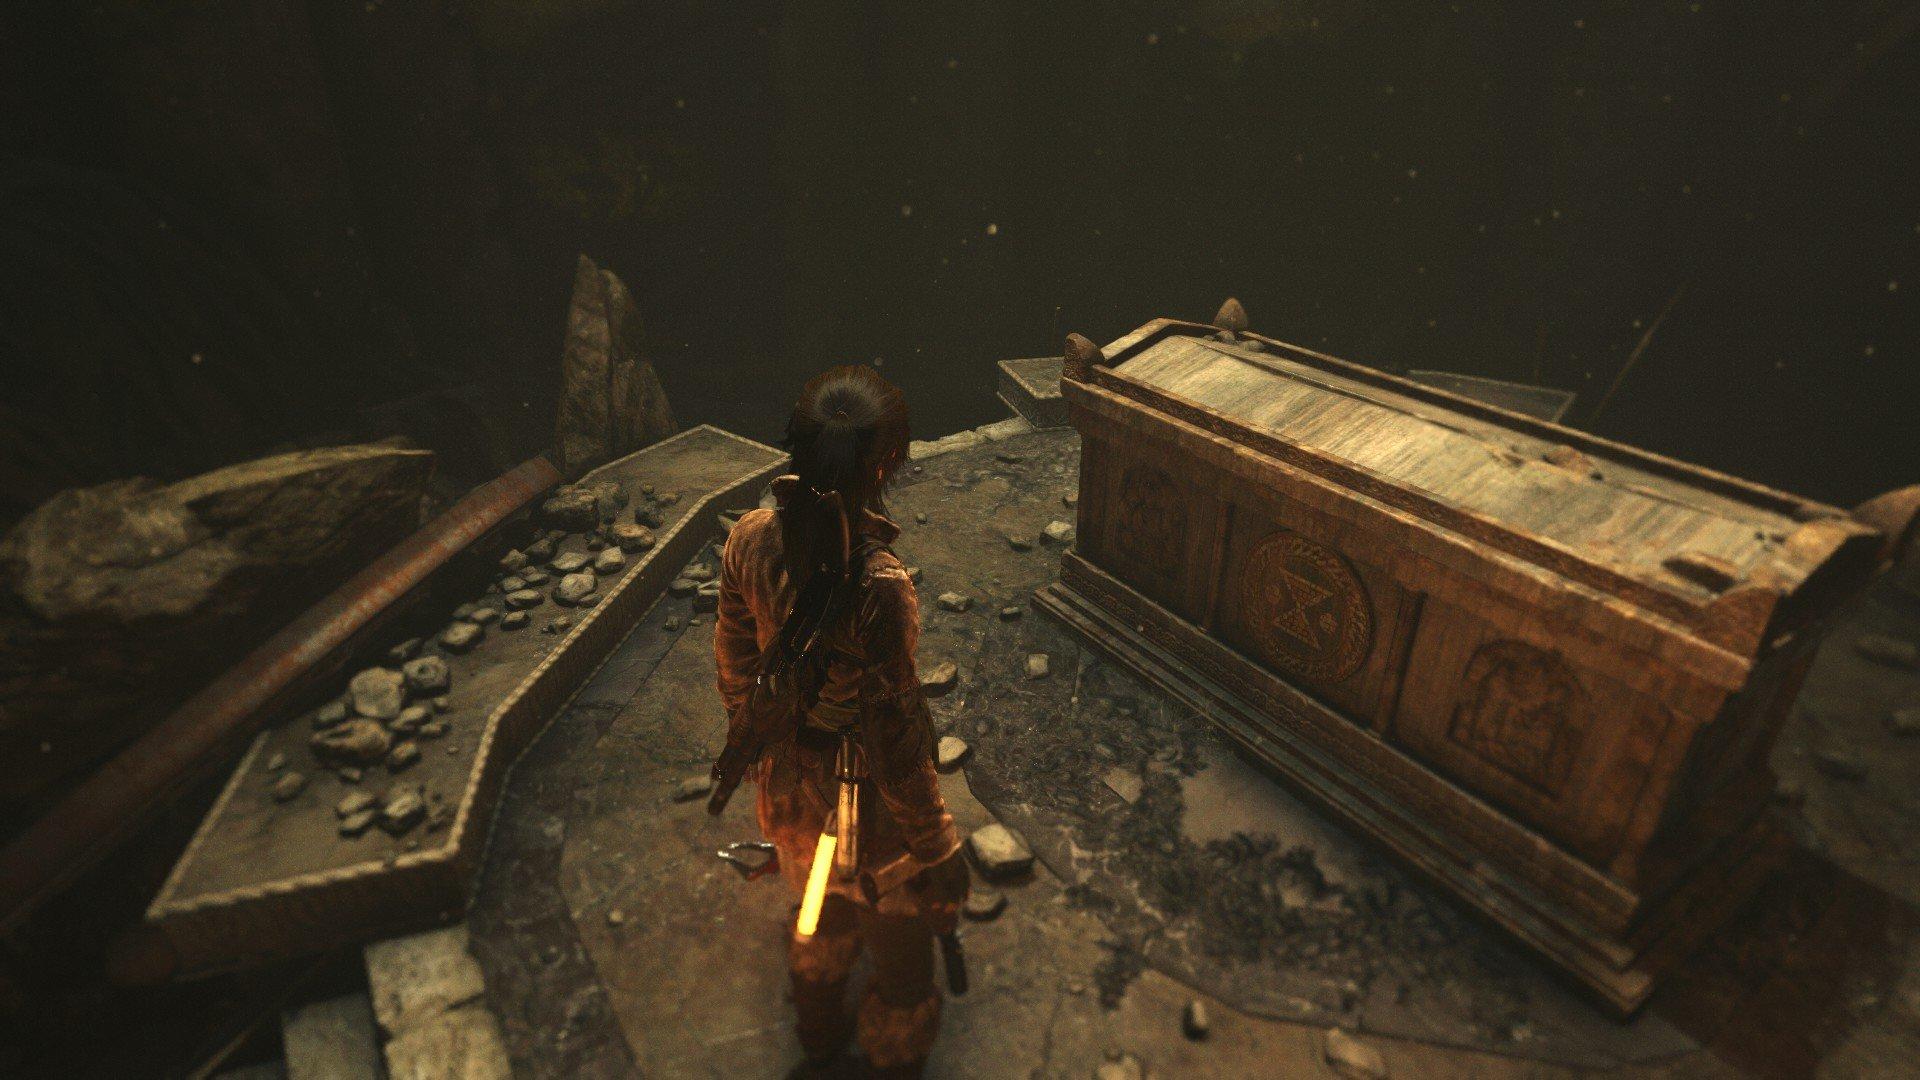 Rise of the Tomb Raider или да когда же этот медведь сдохнет?. - Изображение 37